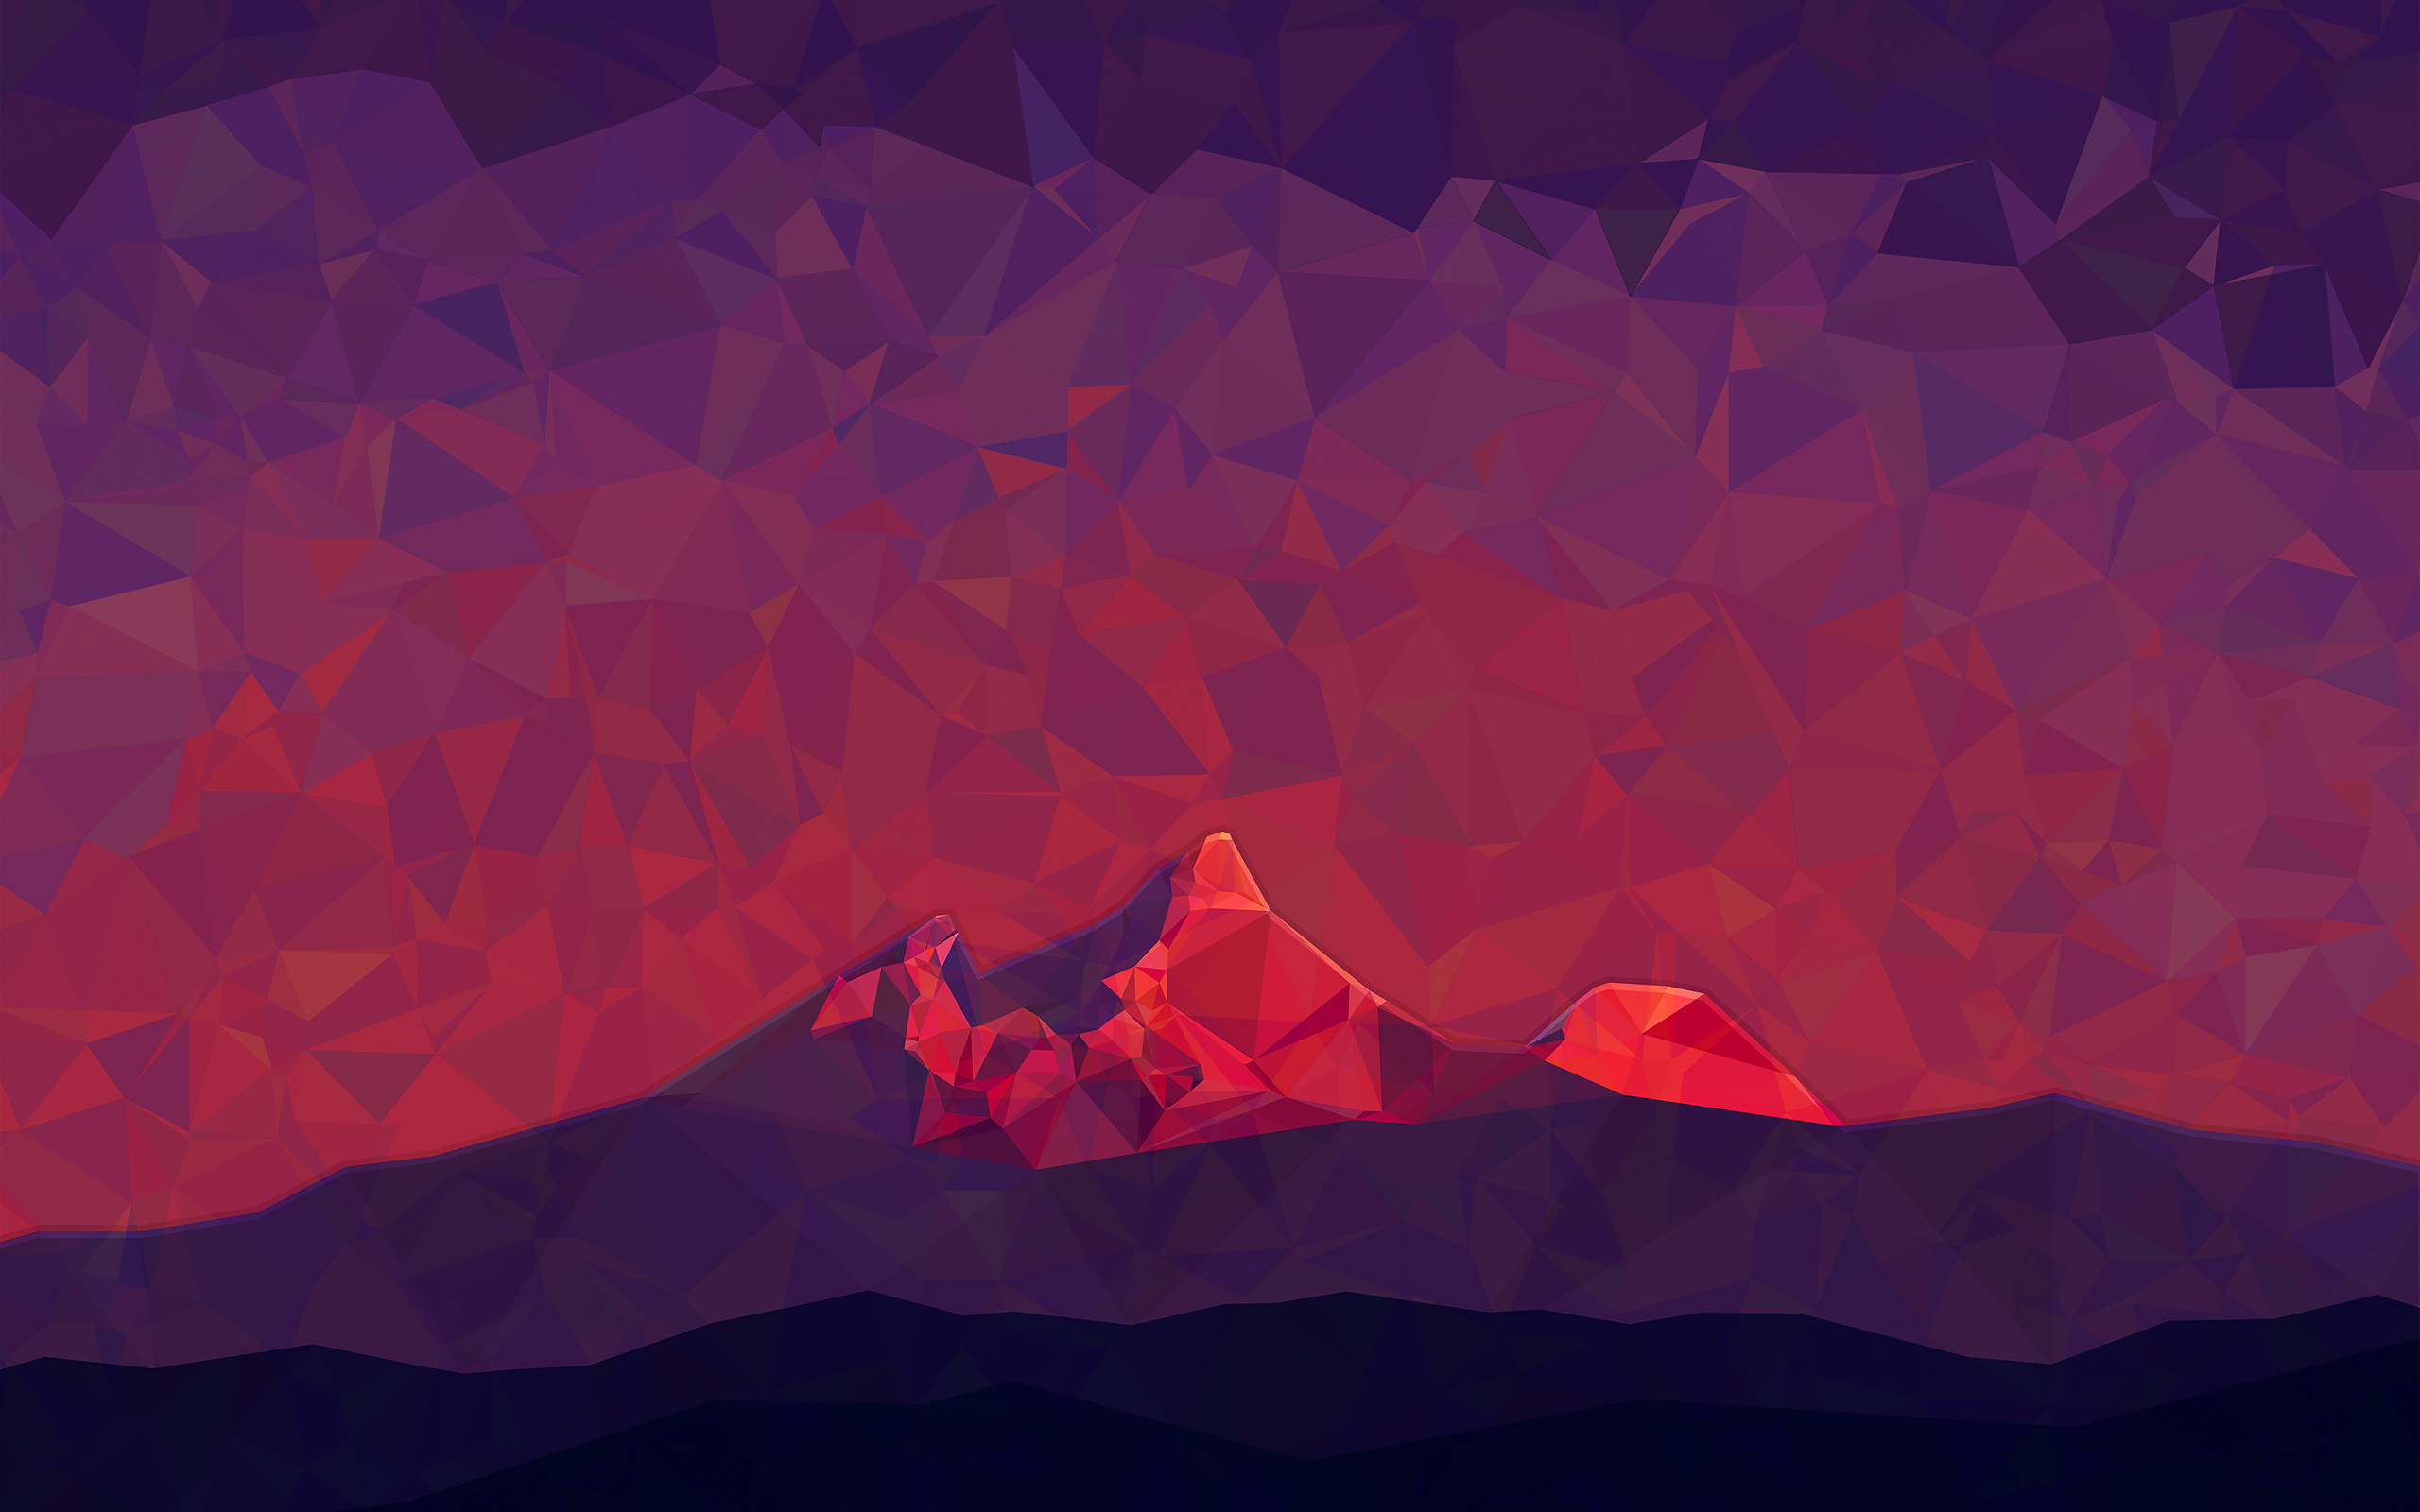 polygon mountain wallpaper - photo #21